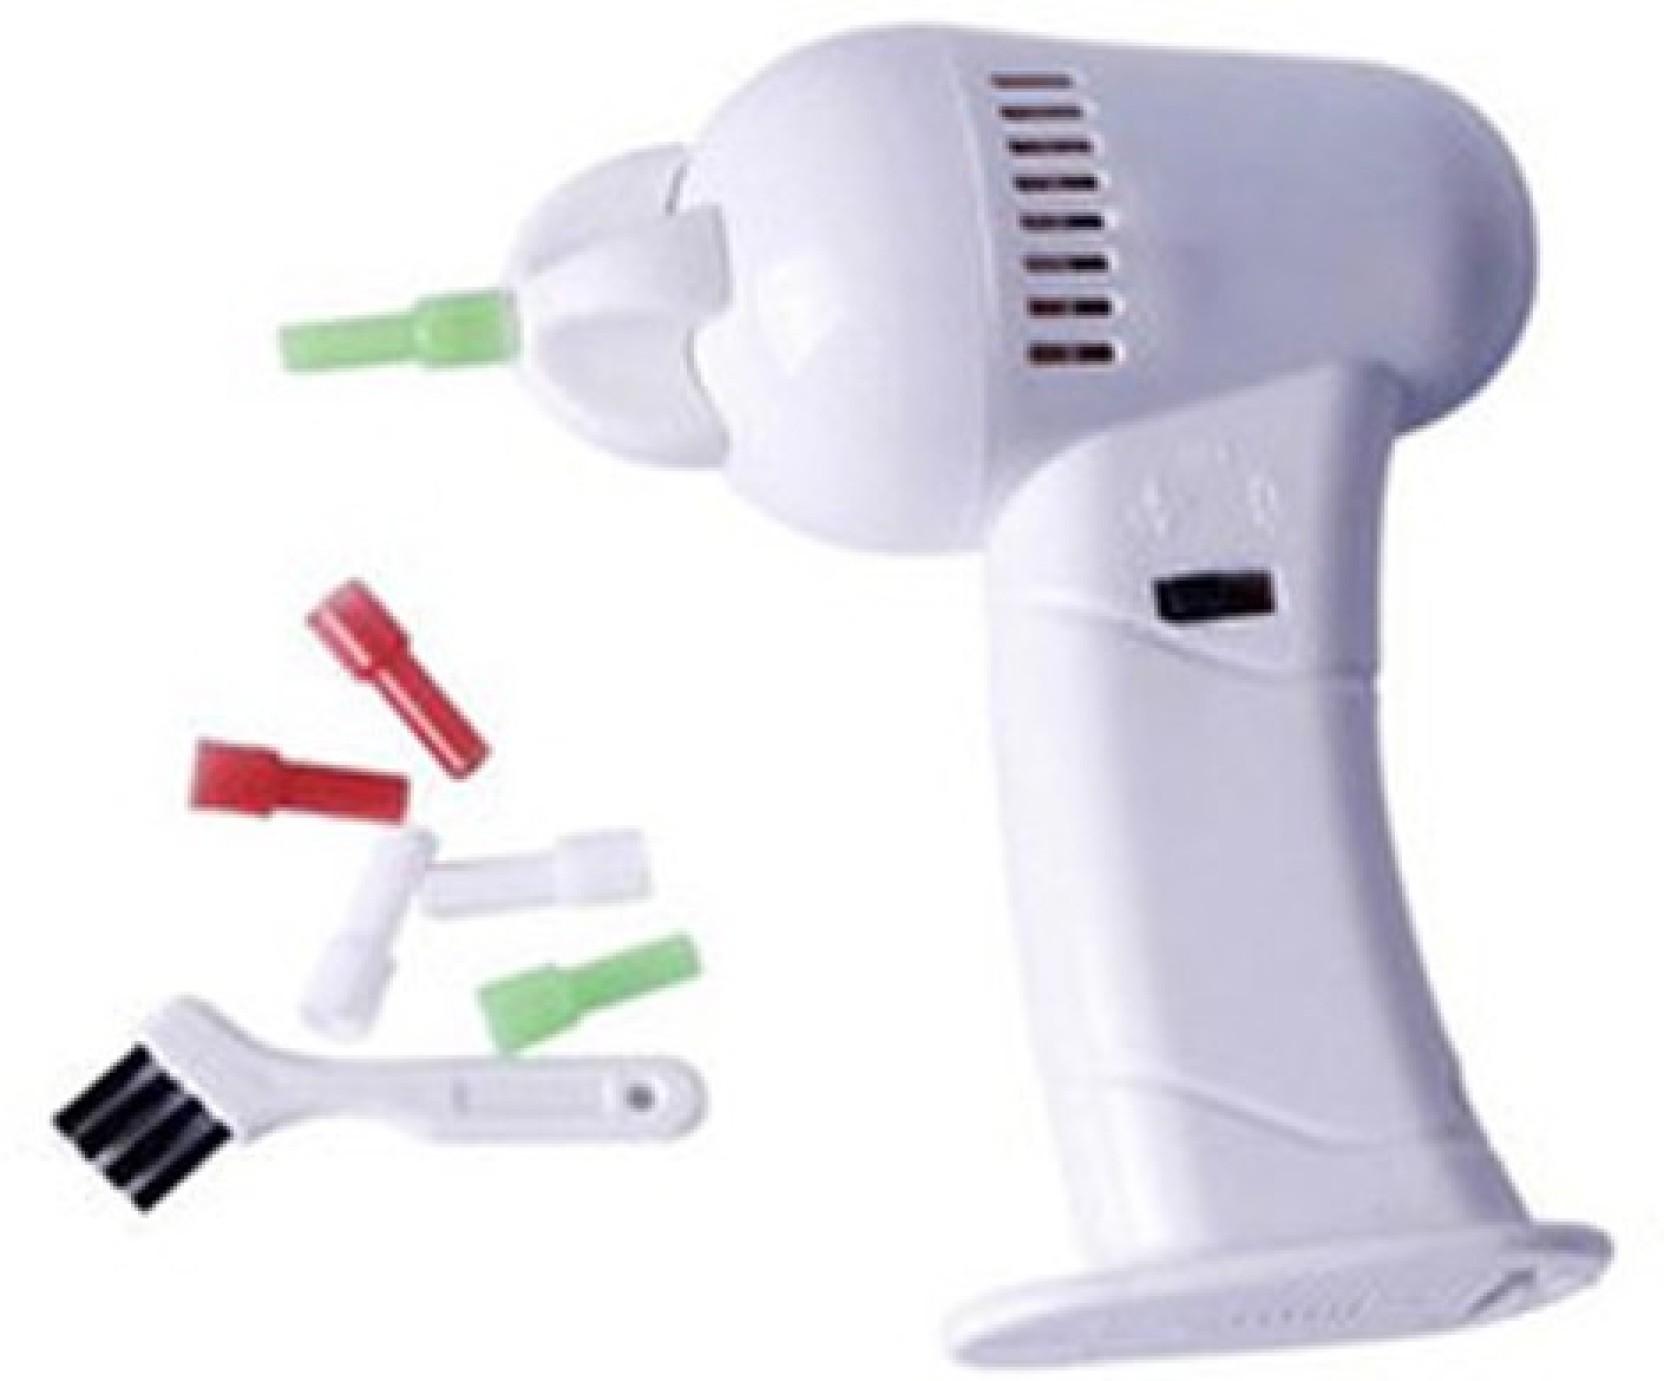 Wax Vac Man Electric Ear Vacuum Removal Alat Pembersih Telinga Whit Pe Remover Cleaner 1664x1381